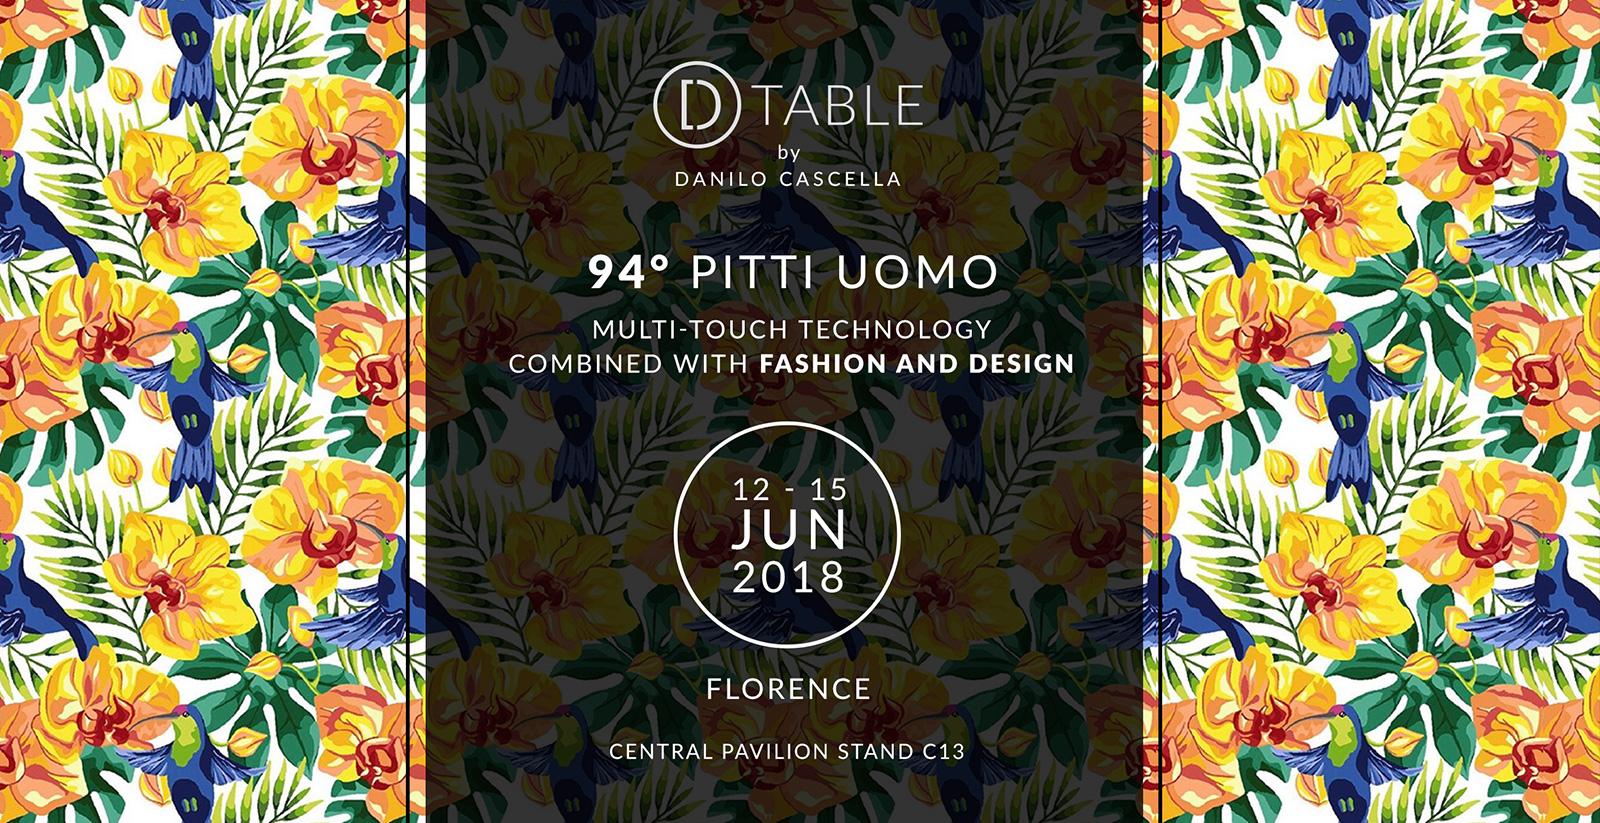 D-Table Event Pitti Uomo